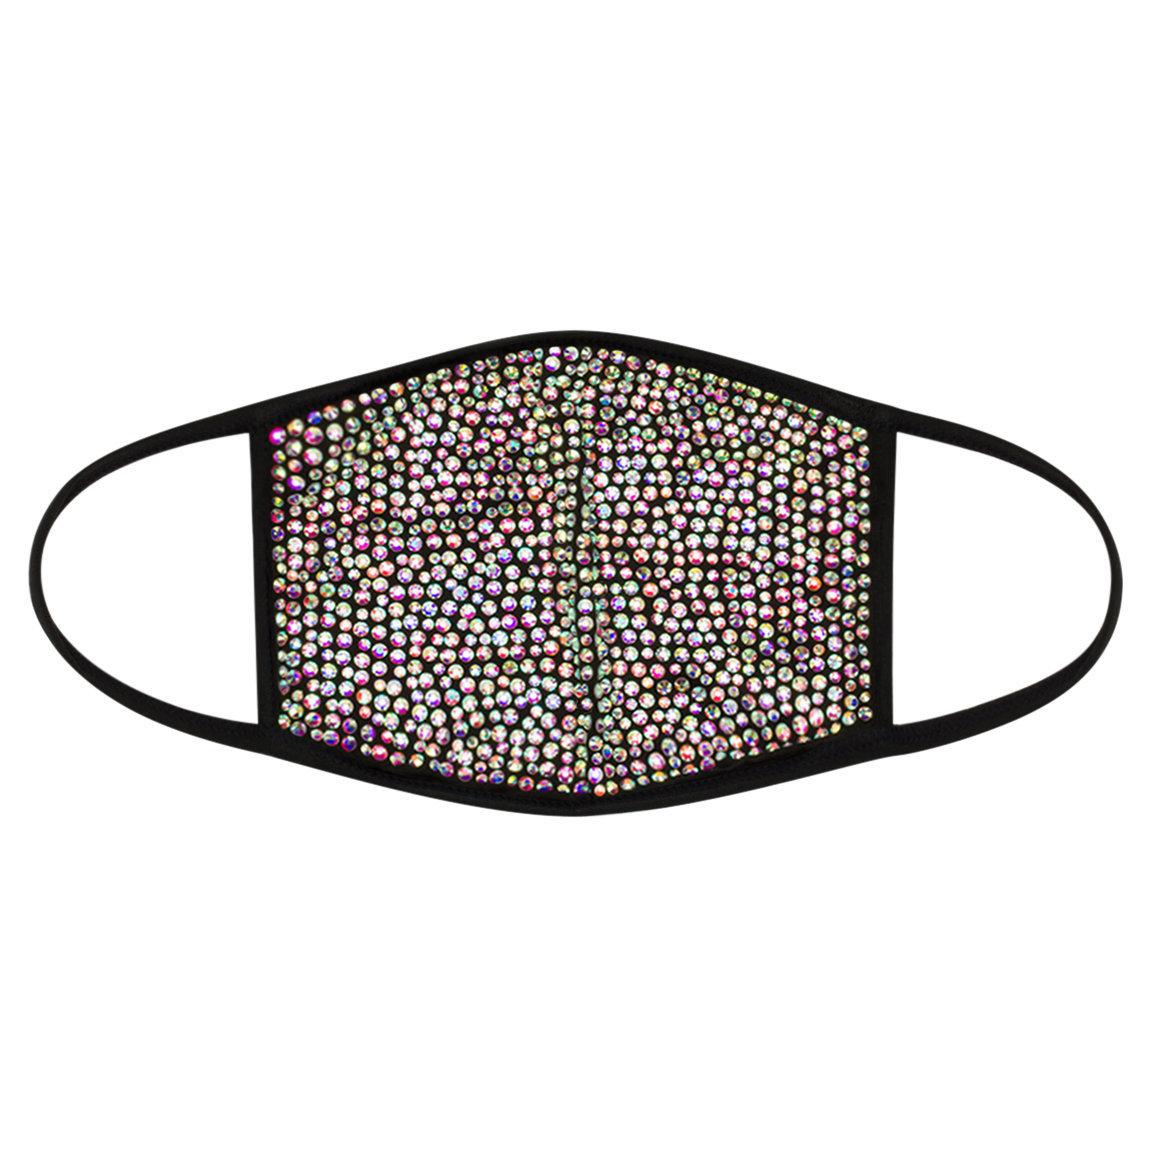 Lit Cosmetics Rhinestone Mask Black Mask - Rainbow Crystal alternative view 1 - product swatch.